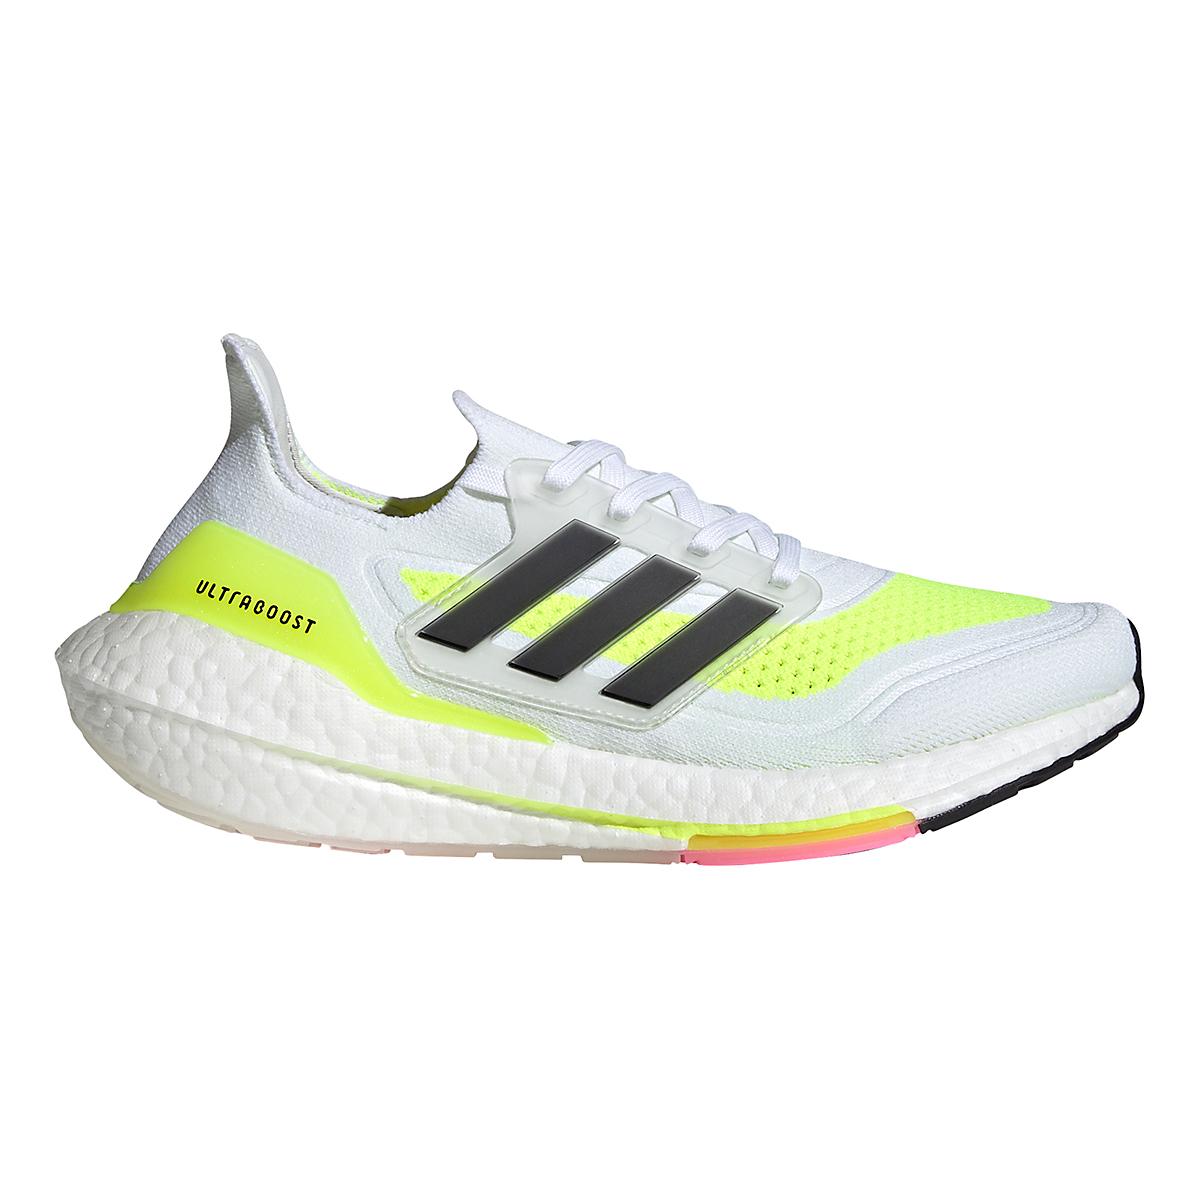 Women's Adidas Ultraboost 21 Running Shoe - Color: Cloud White/Black/Solar Yellow - Size: 5 - Width: Regular, Cloud White/Black/Solar Yellow, large, image 1